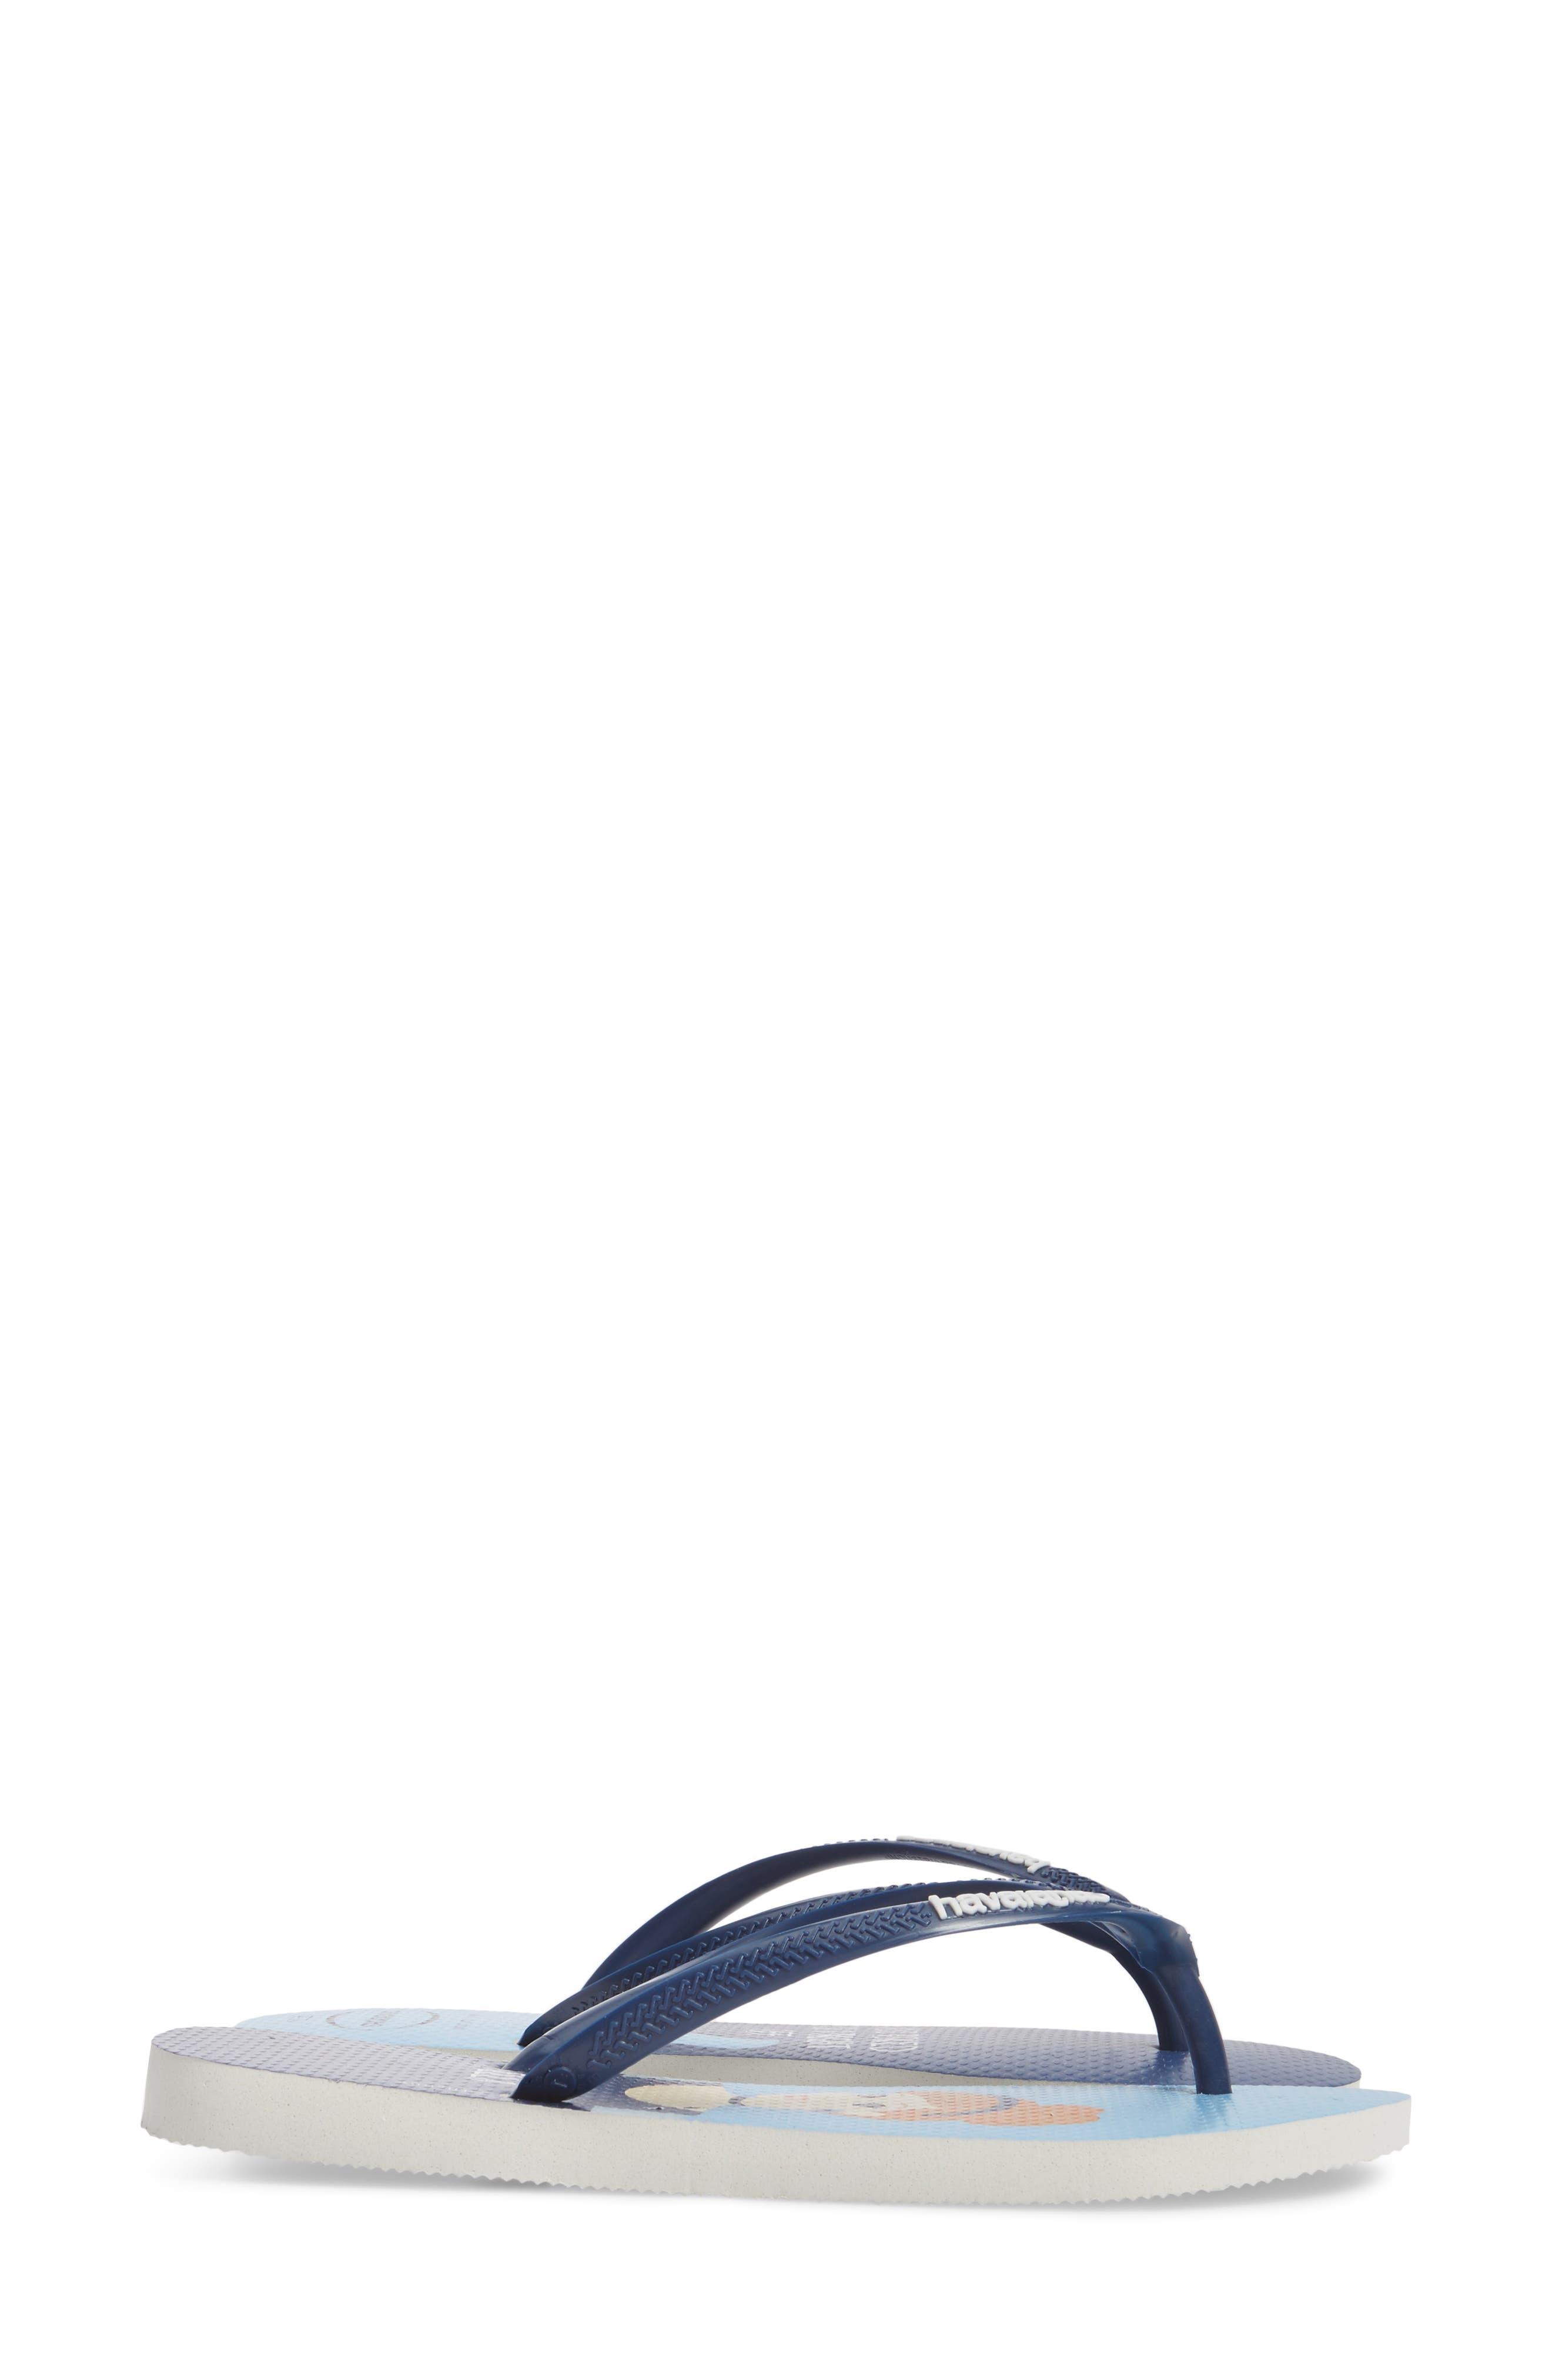 Havaiana Slim - Disney Princess Flip Flop,                             Alternate thumbnail 3, color,                             401